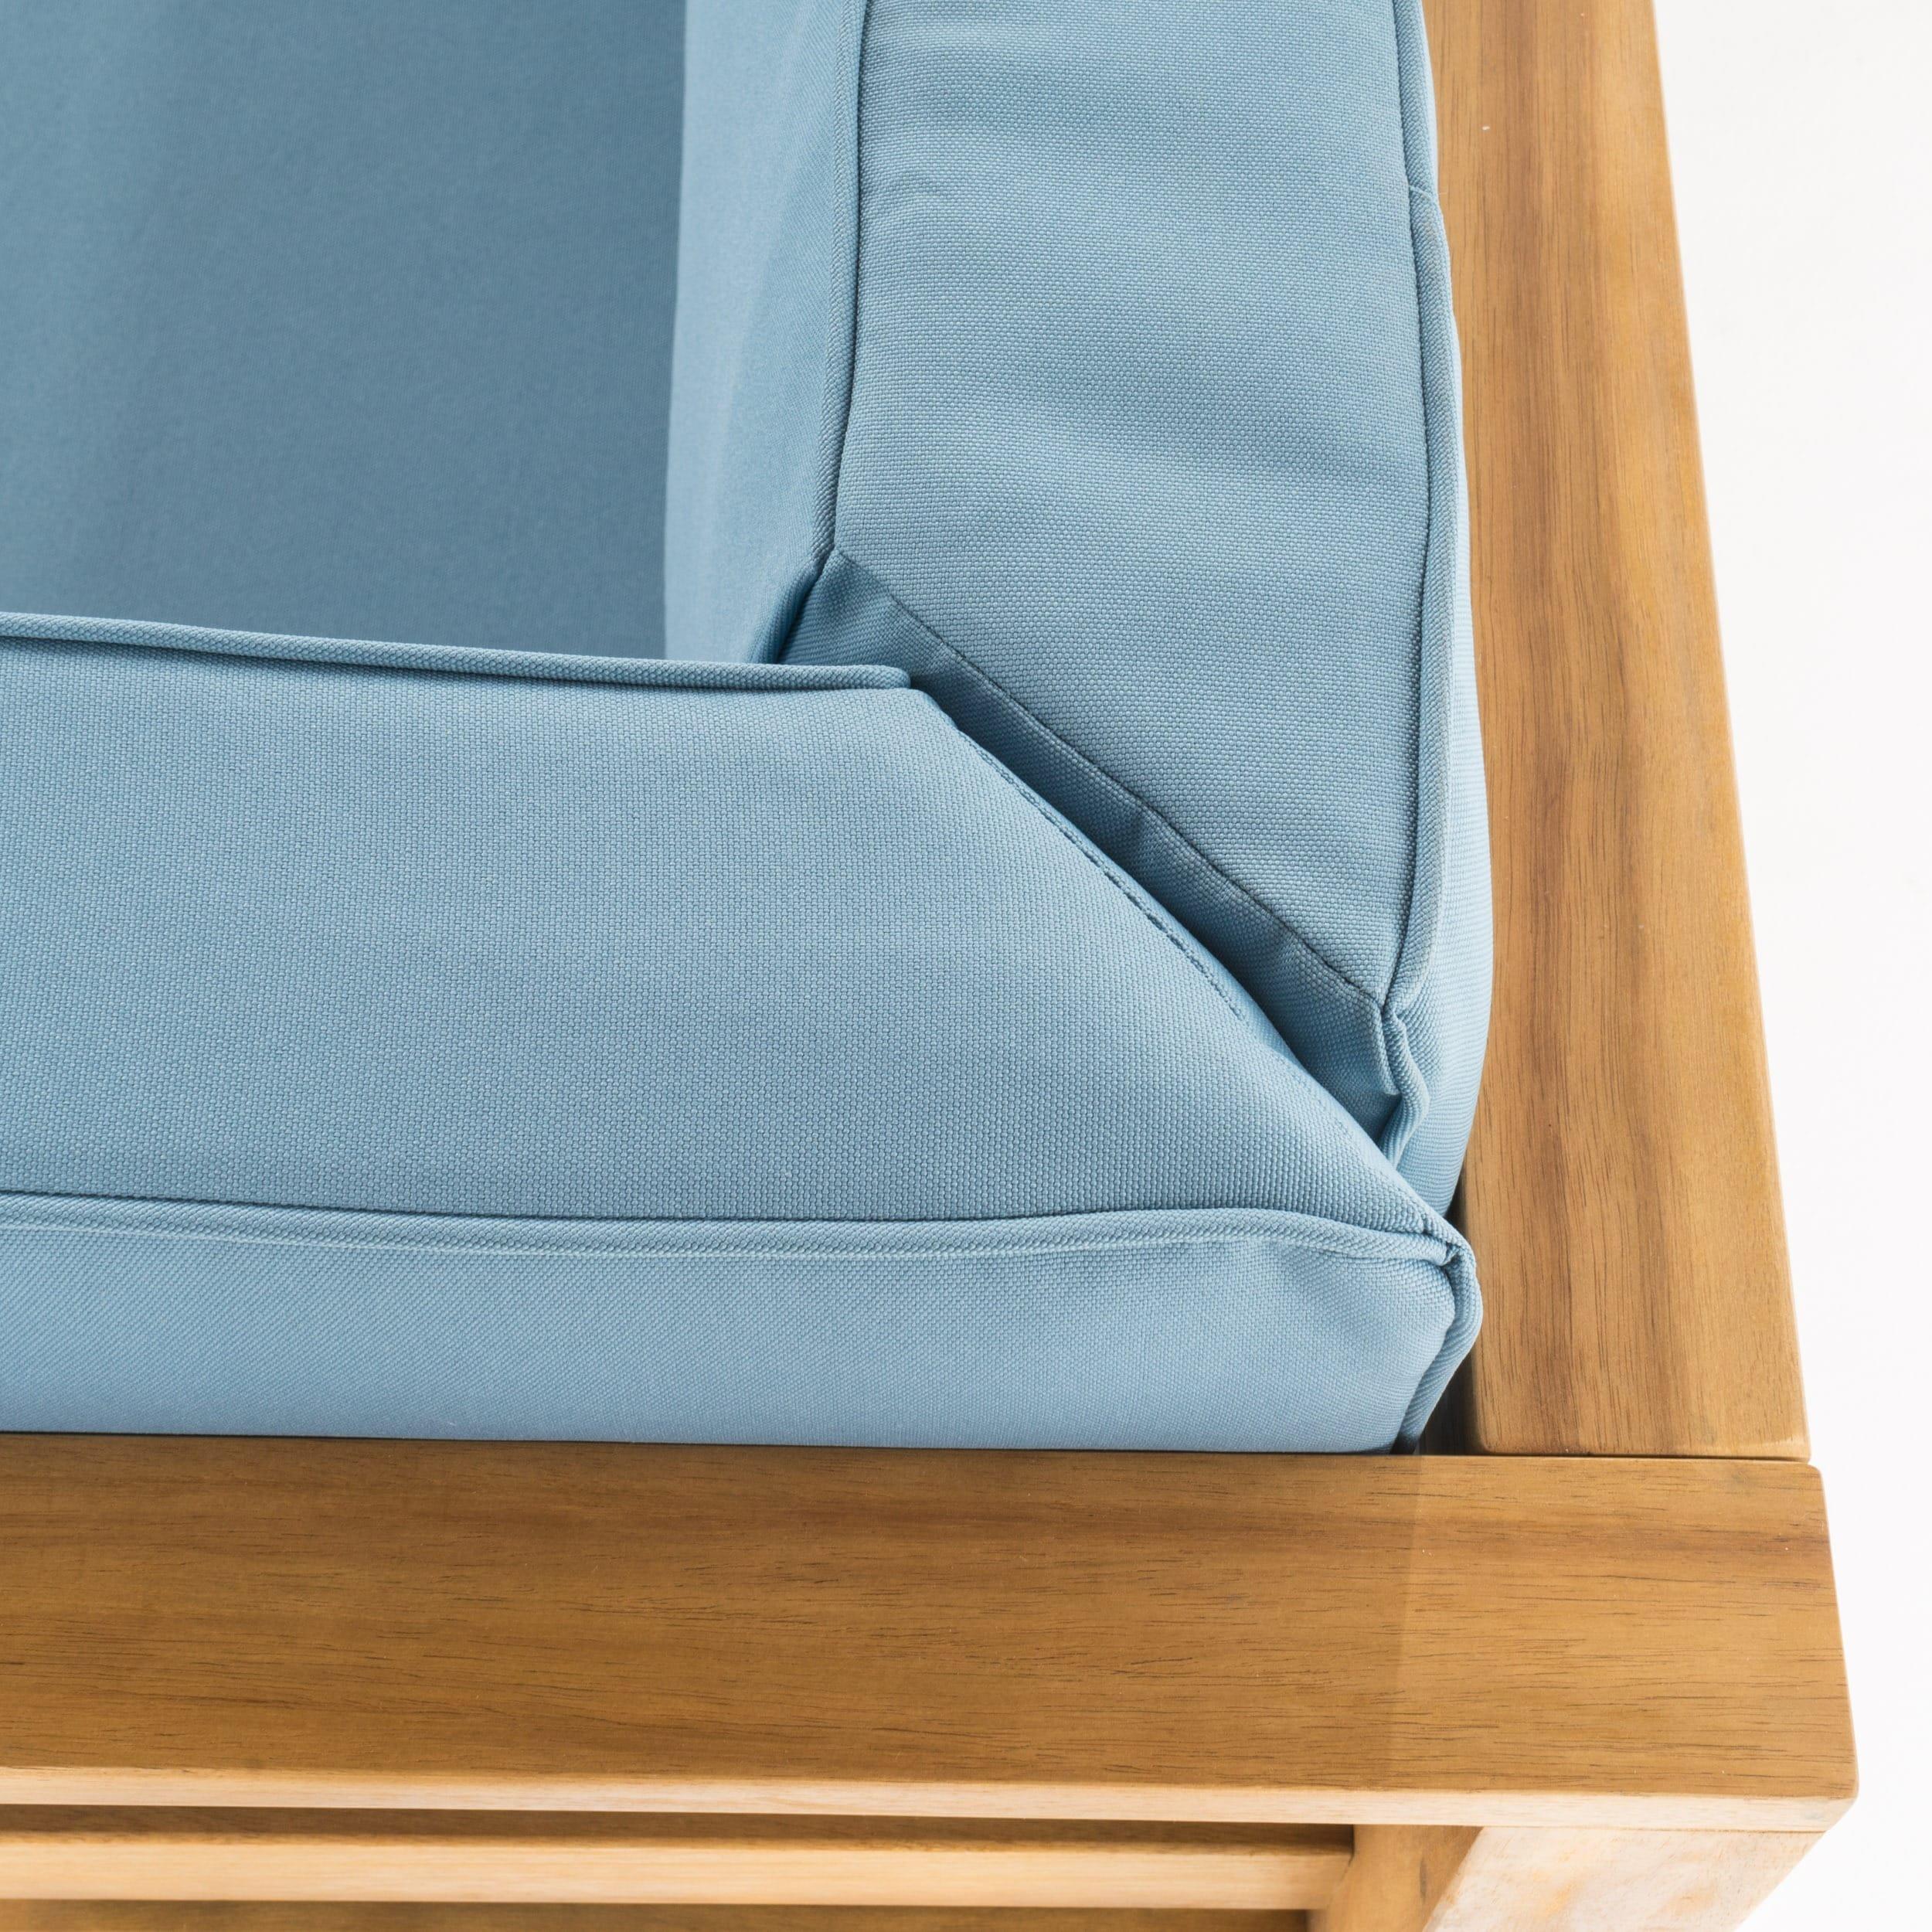 Shop Oana Outdoor 4-Piece Acacia Wood Sectional Sofa Set with ...